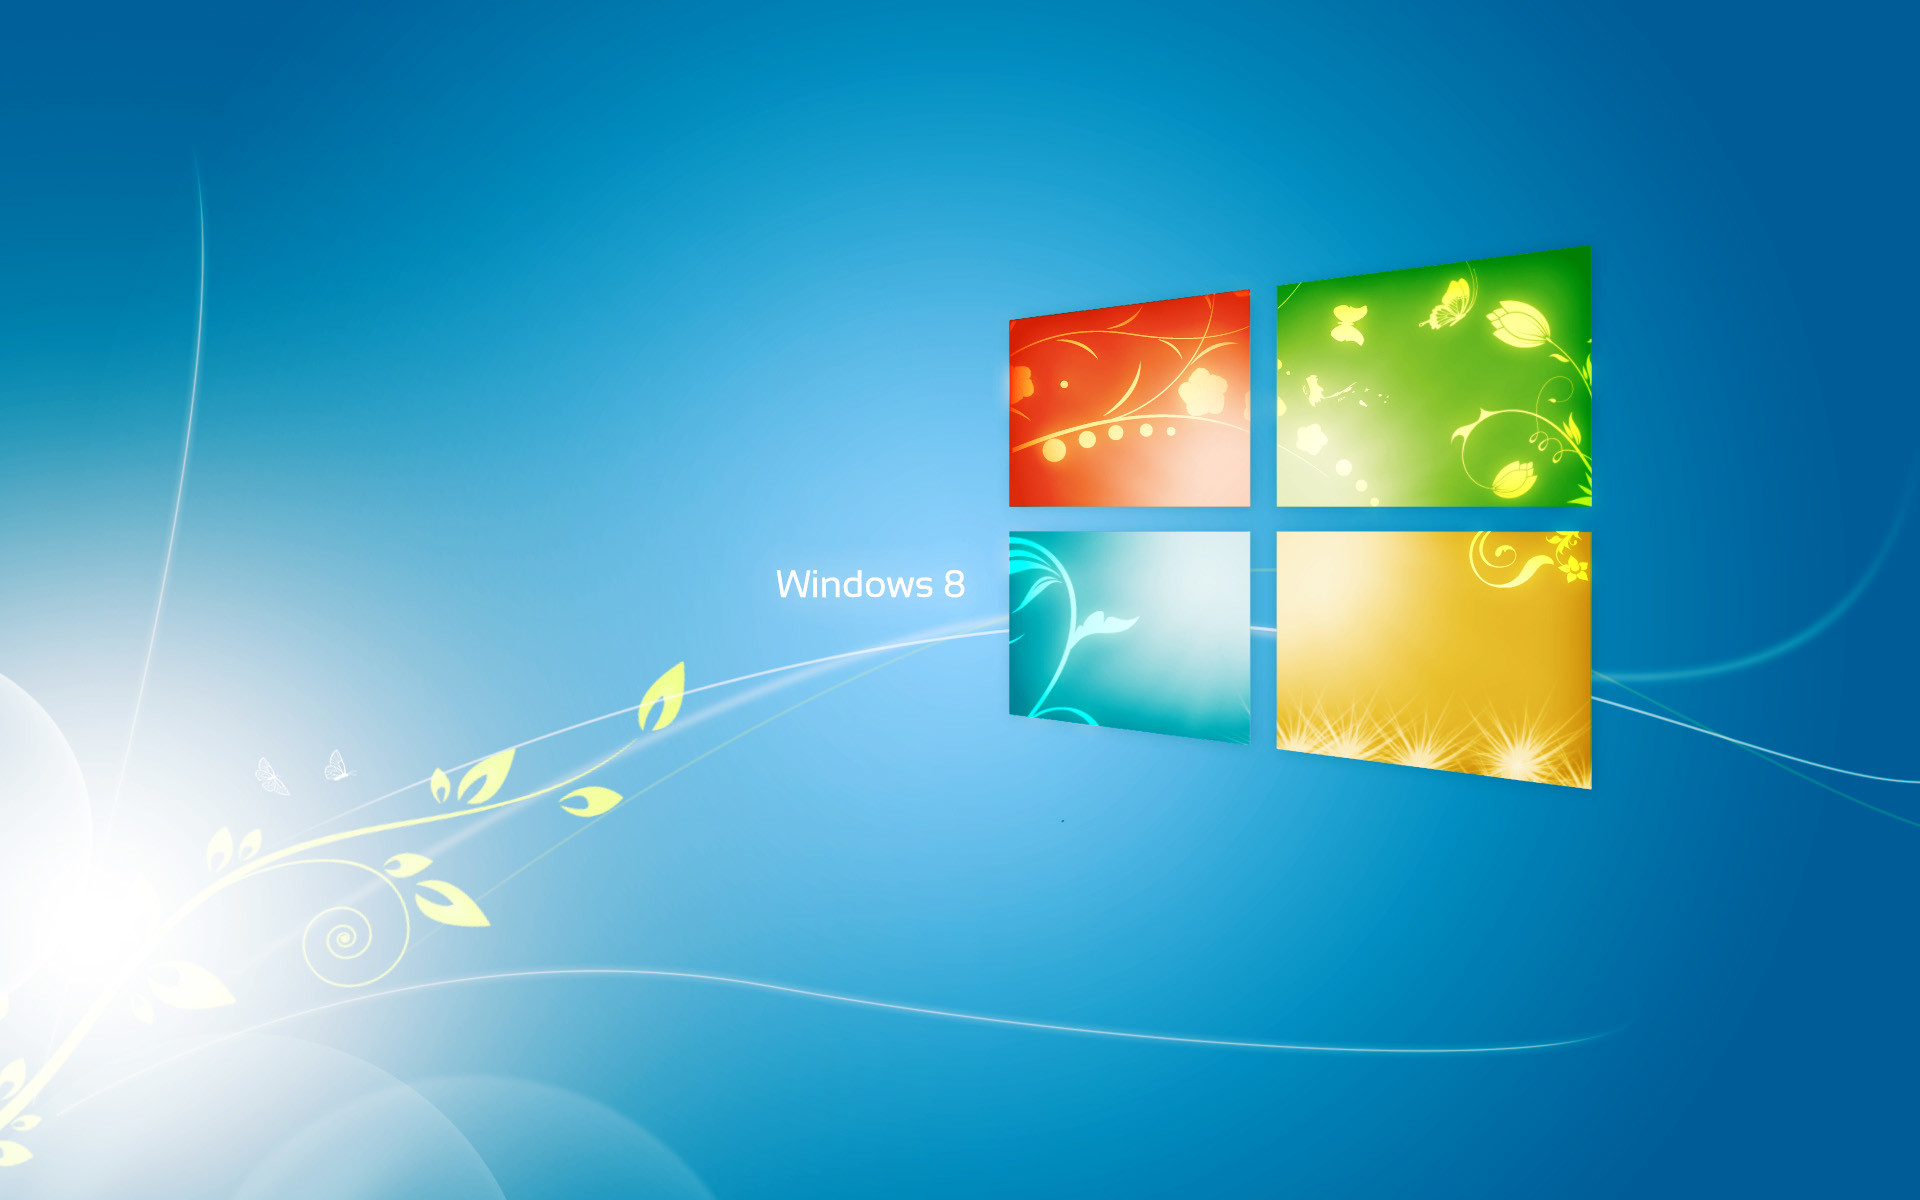 … awesome windows 8 wallpaper hd …